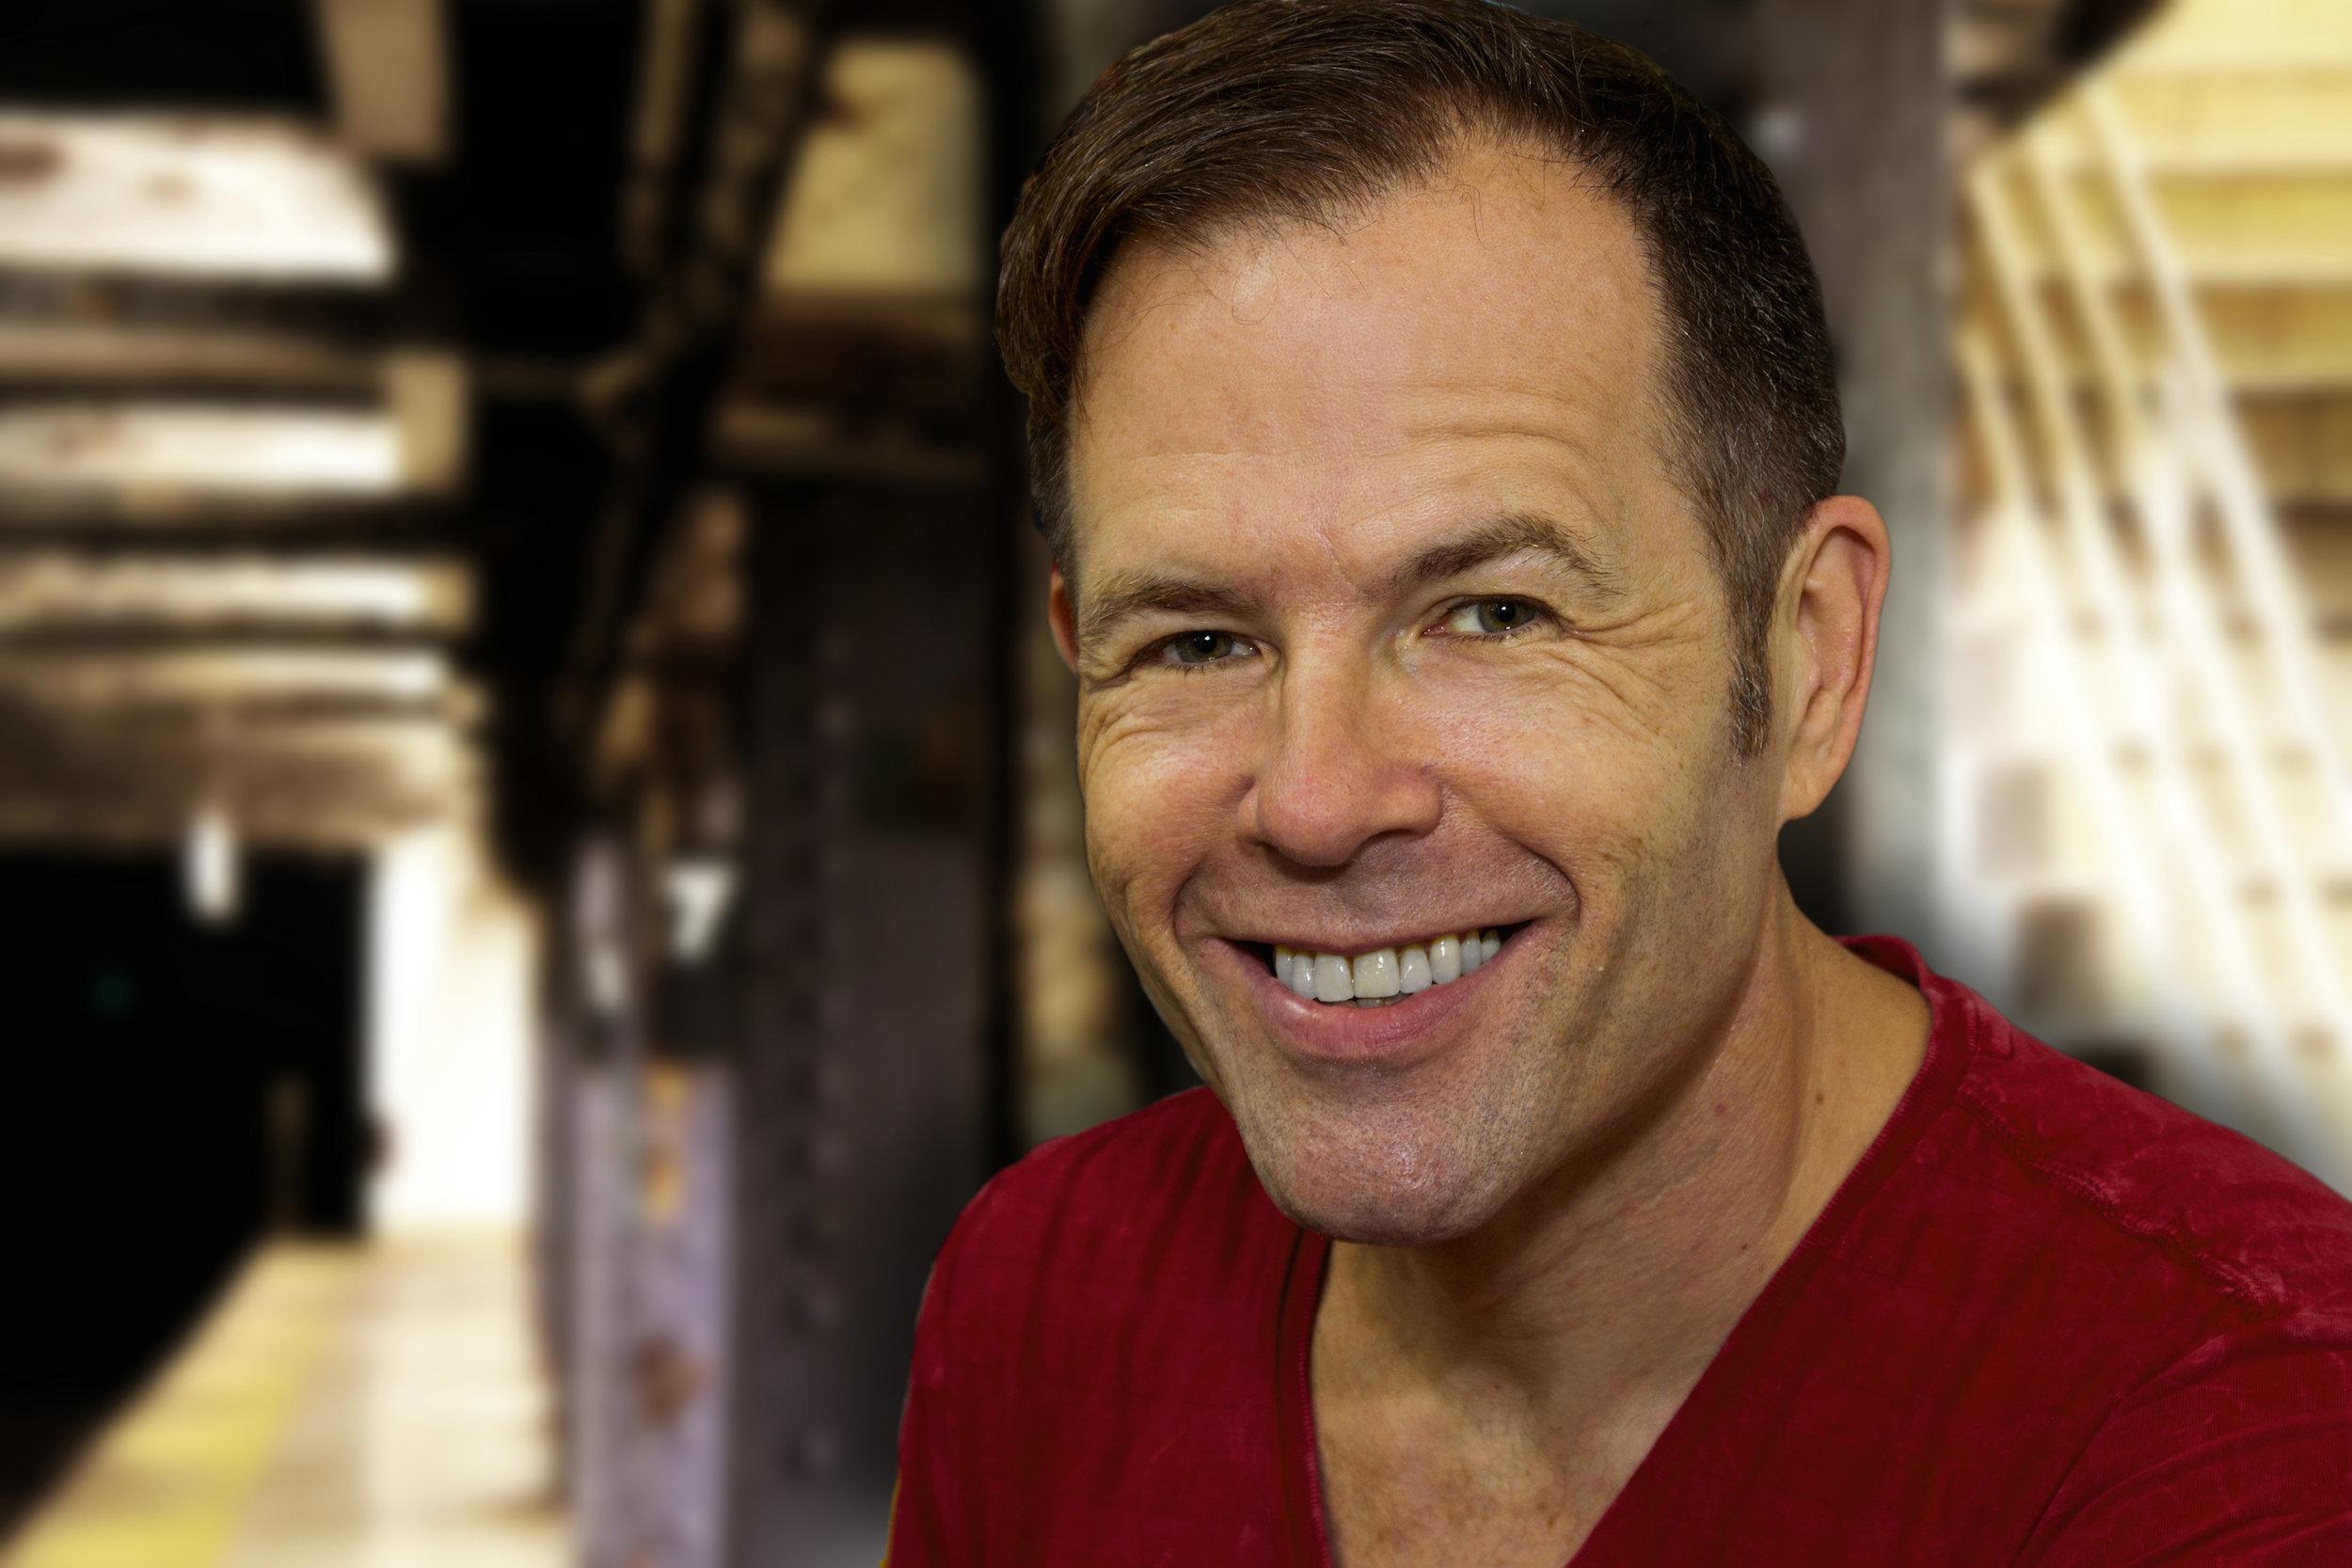 Greg Tirggs, producer, director, improviser, emcee